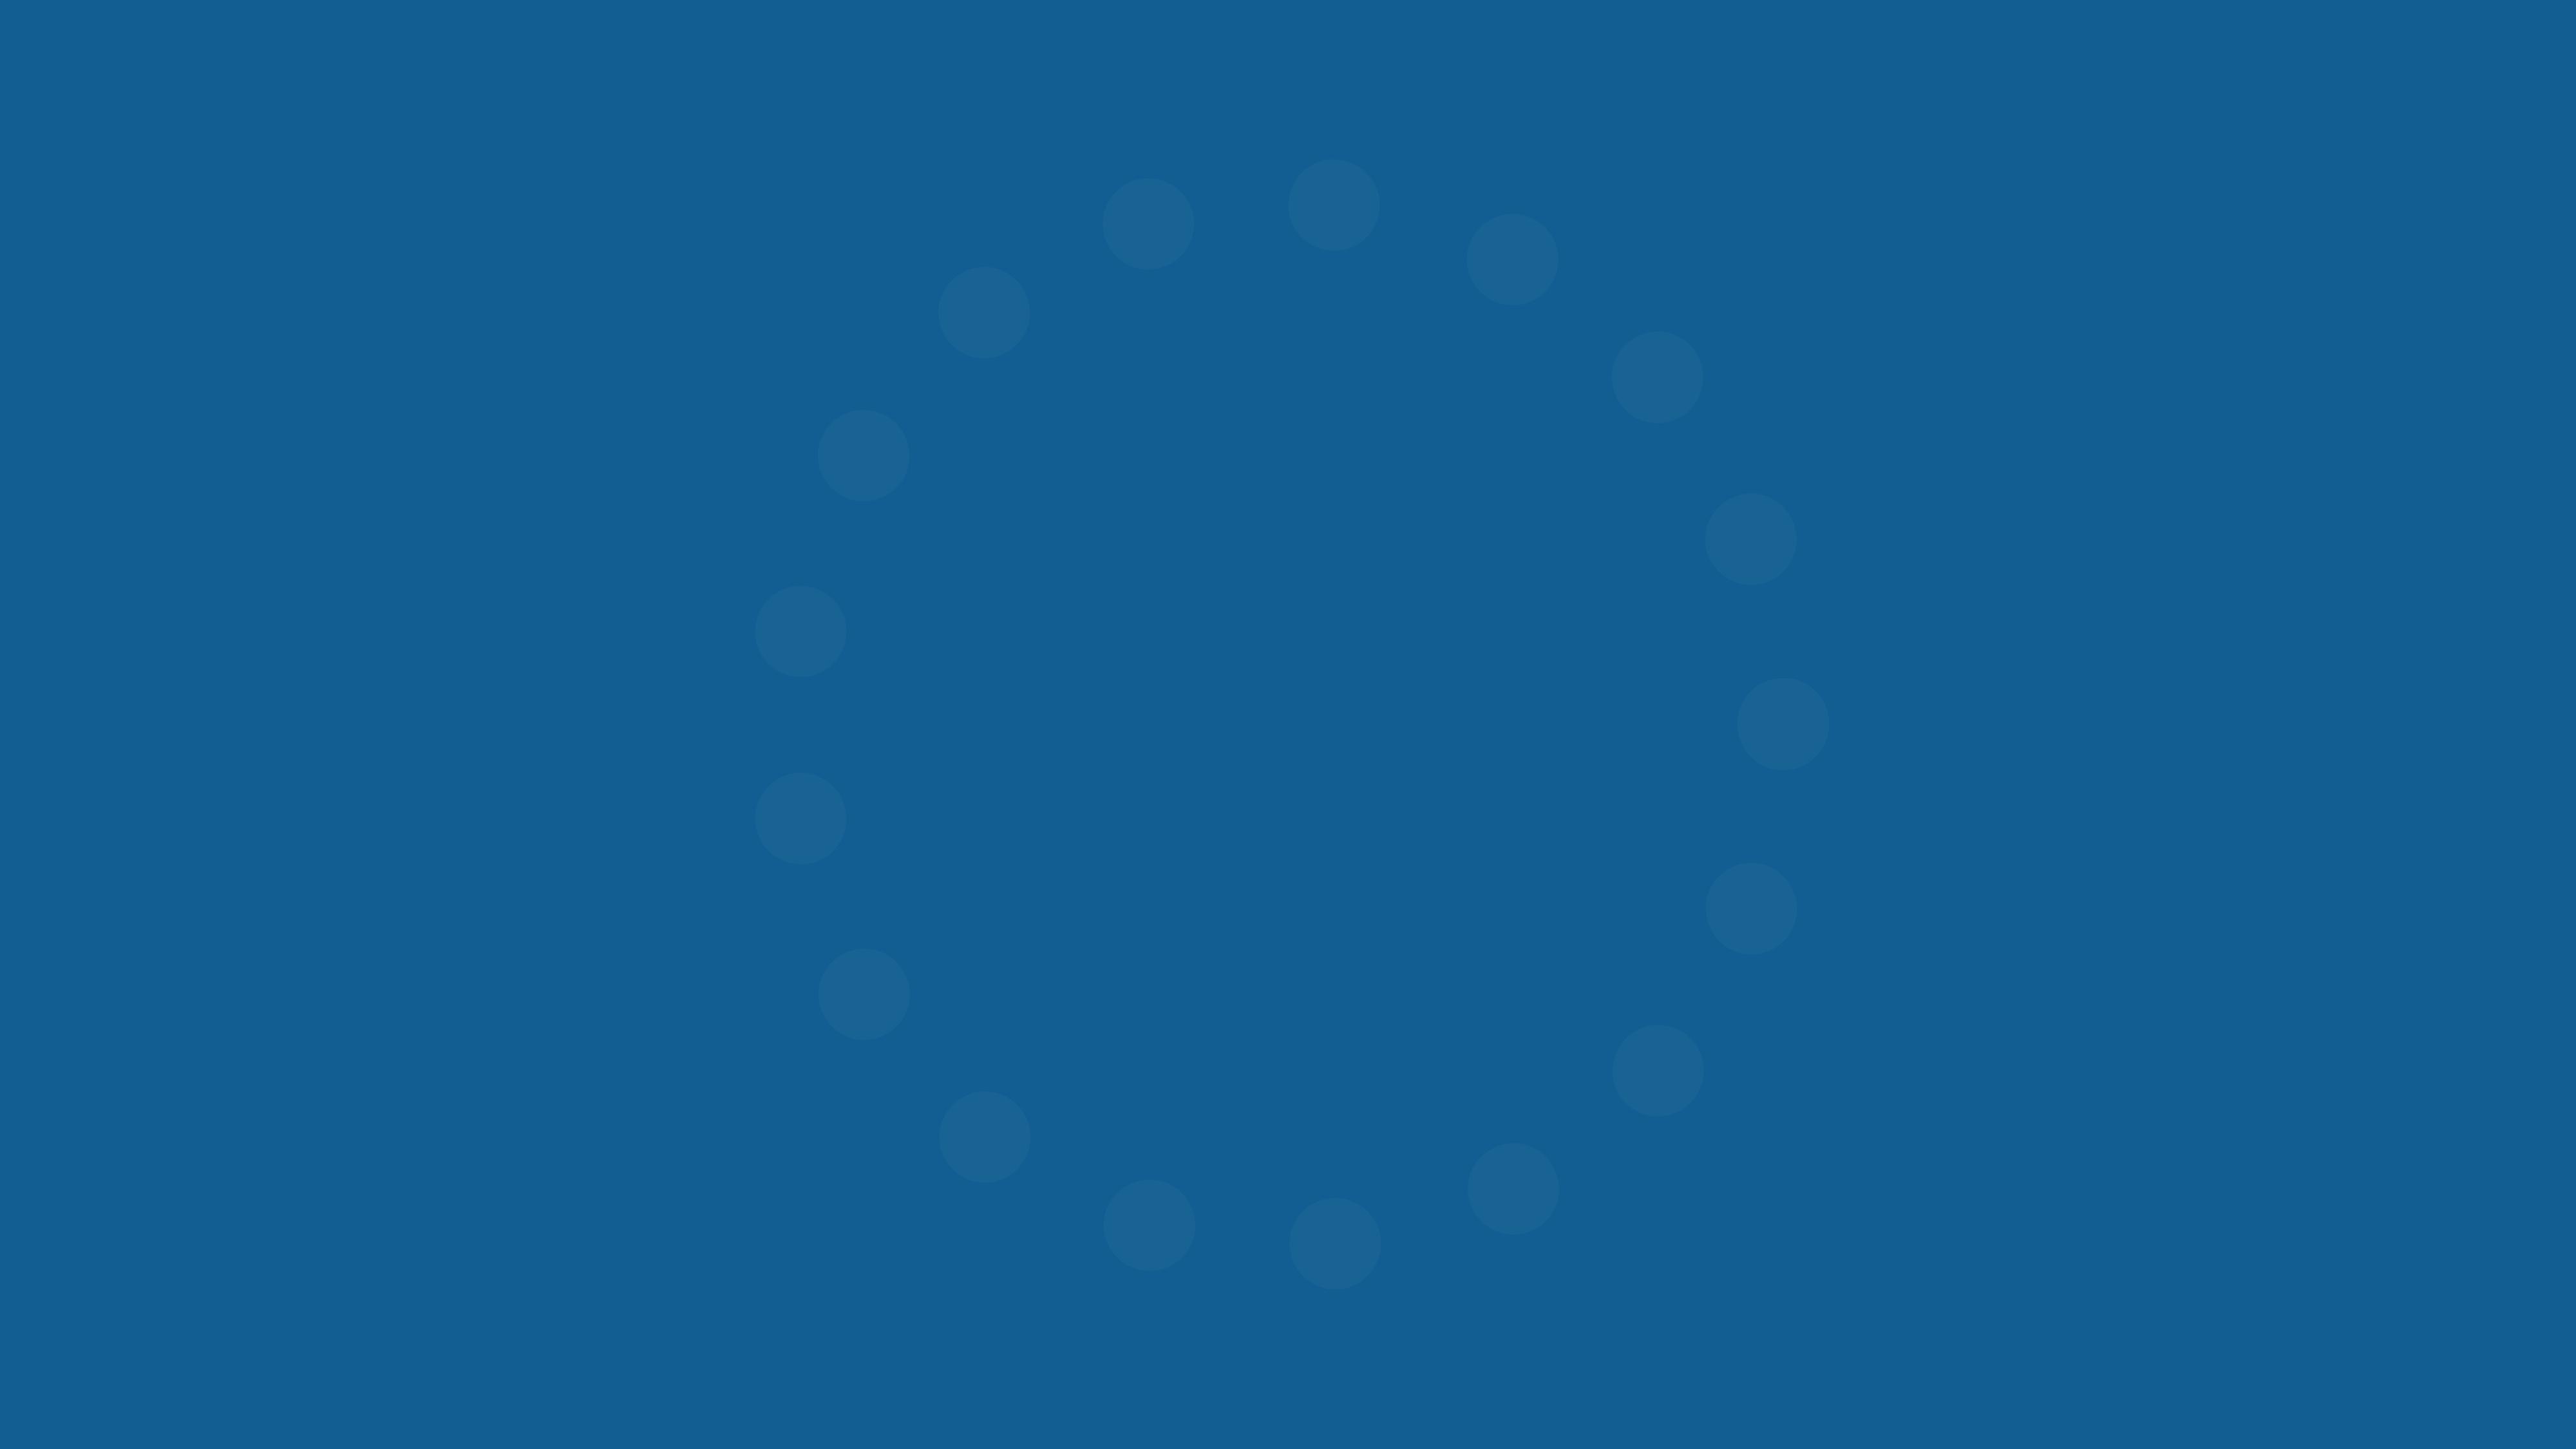 single_circle_center_bg_blue-01